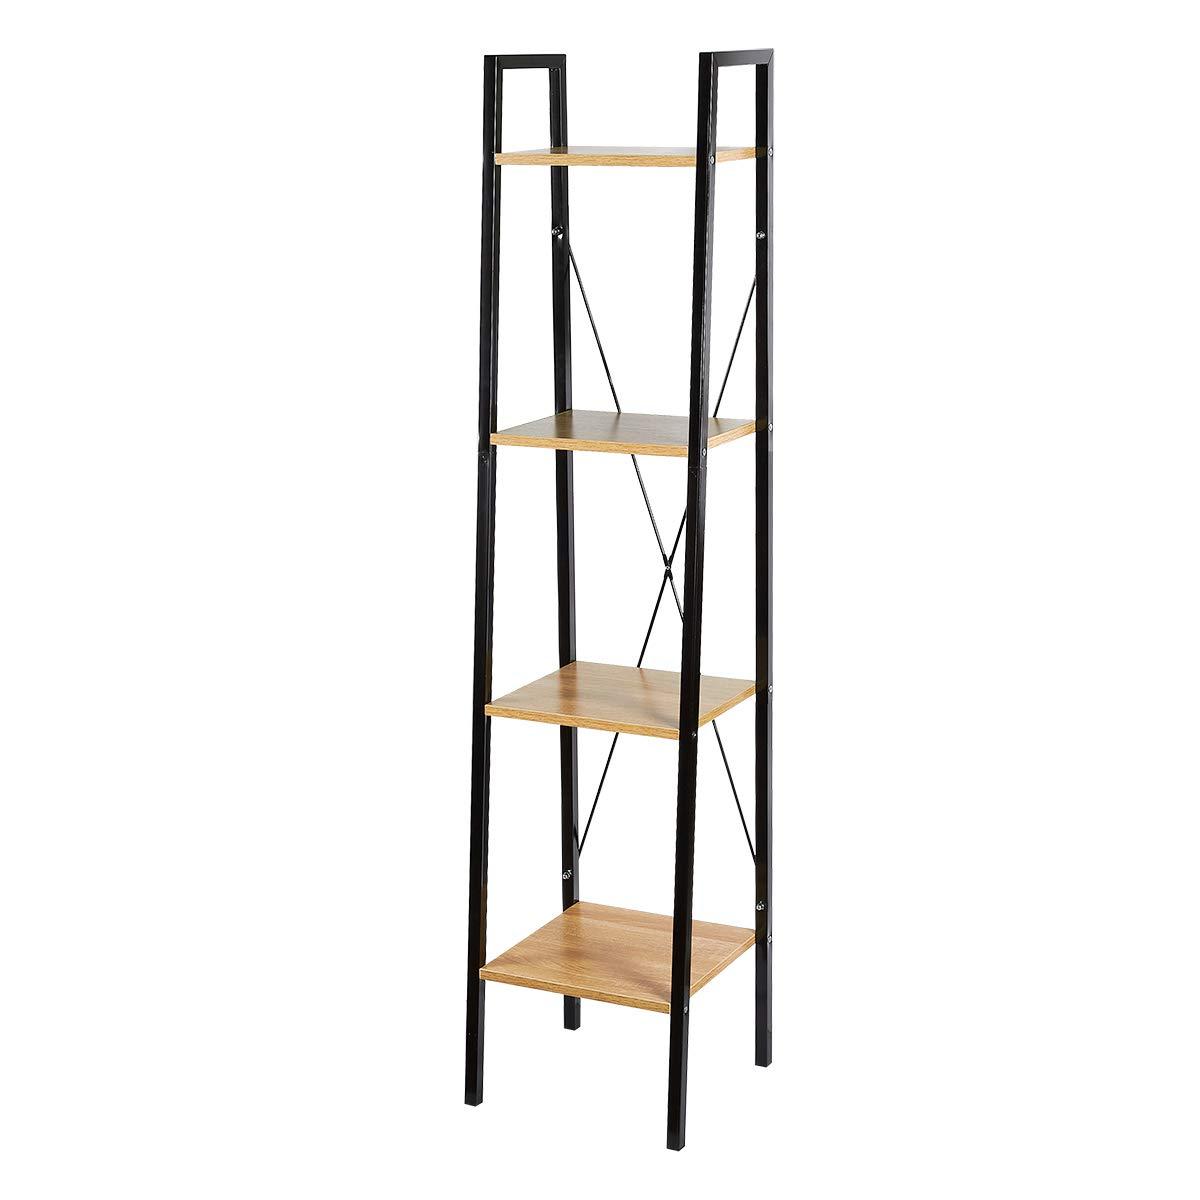 Juvale Ladder Shelf - 3 Tier Shelf, Plant Shelf, Metal and Wood Storage Shelf, Display Shelf, Multipurpose, 58.1 x 13.3 x 10.5 inches